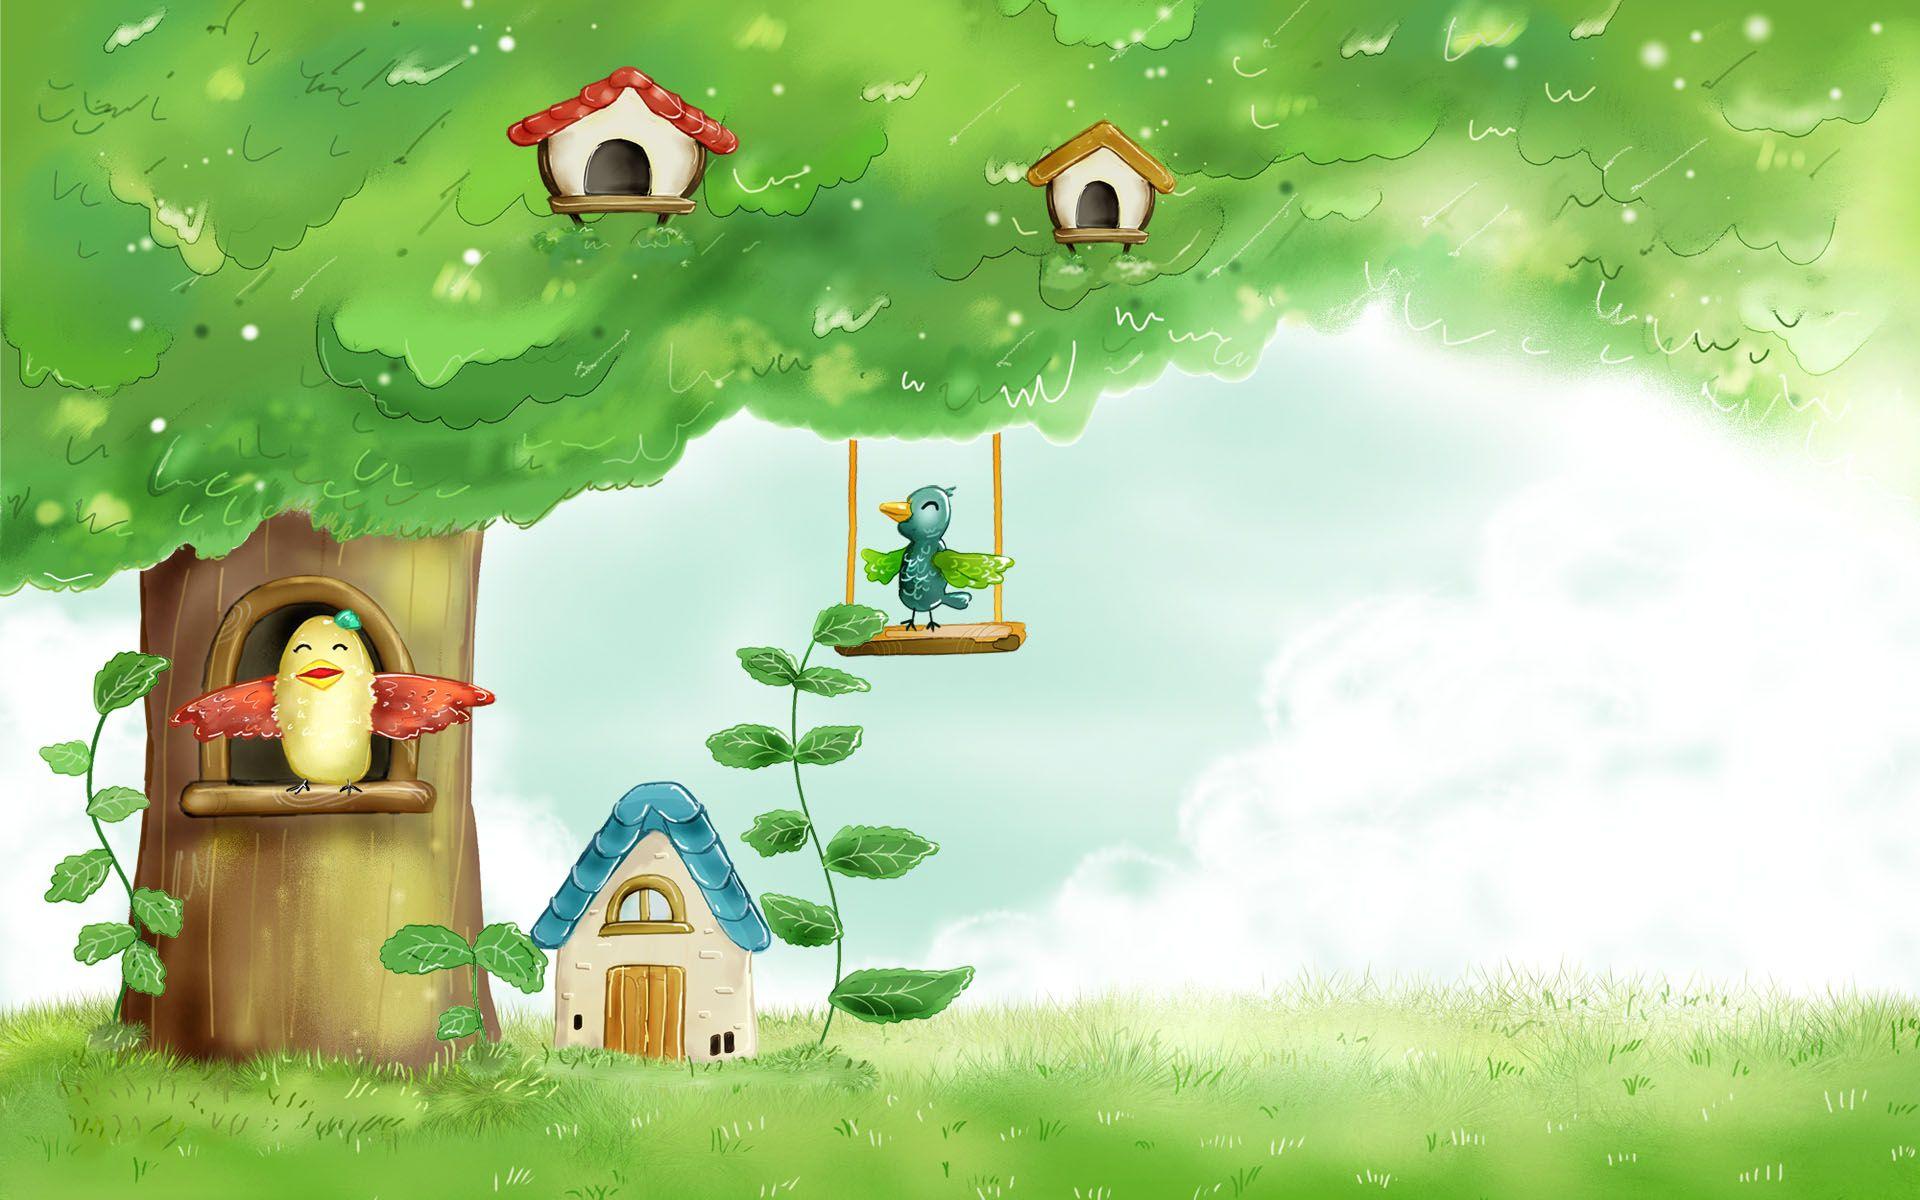 medium resolution of free spring clipart backgrounds cartoon vector illustration spring wallpapers 1920x1200 vector spring